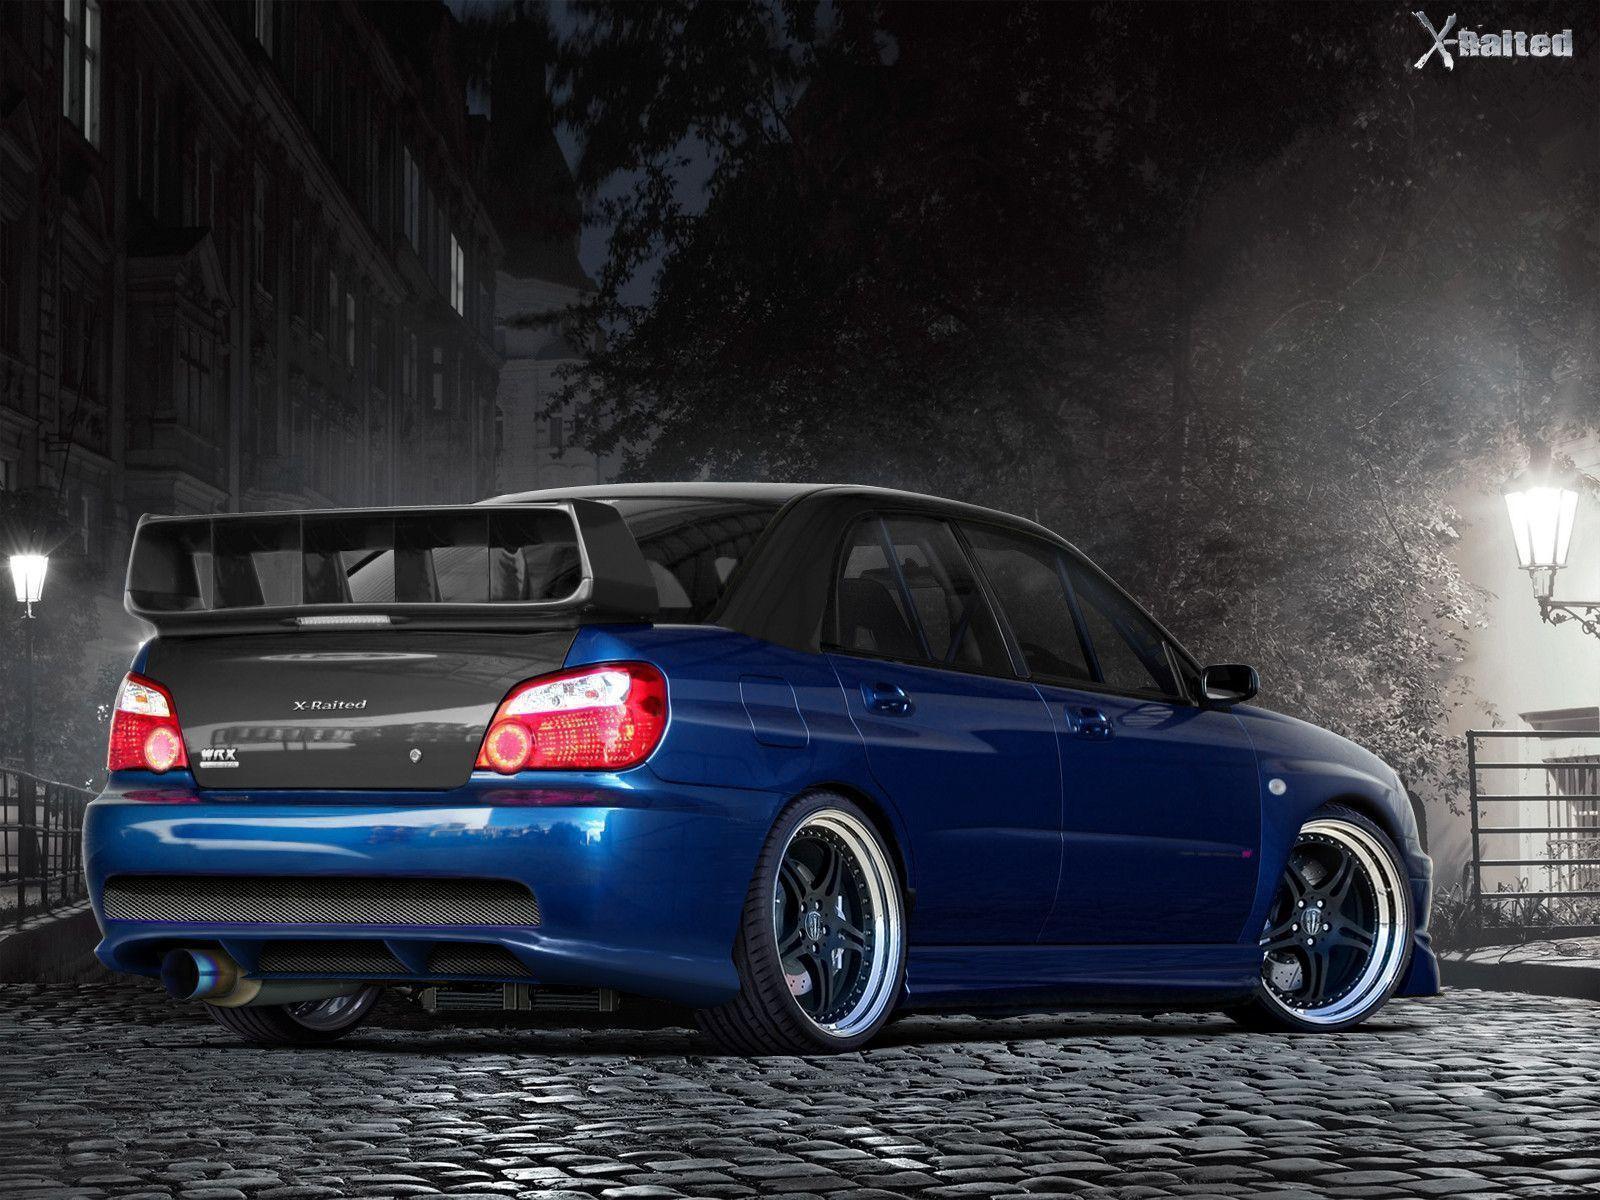 Hd Nfs Cars Wallpapers Subaru Impreza Wallpapers Wallpaper Cave